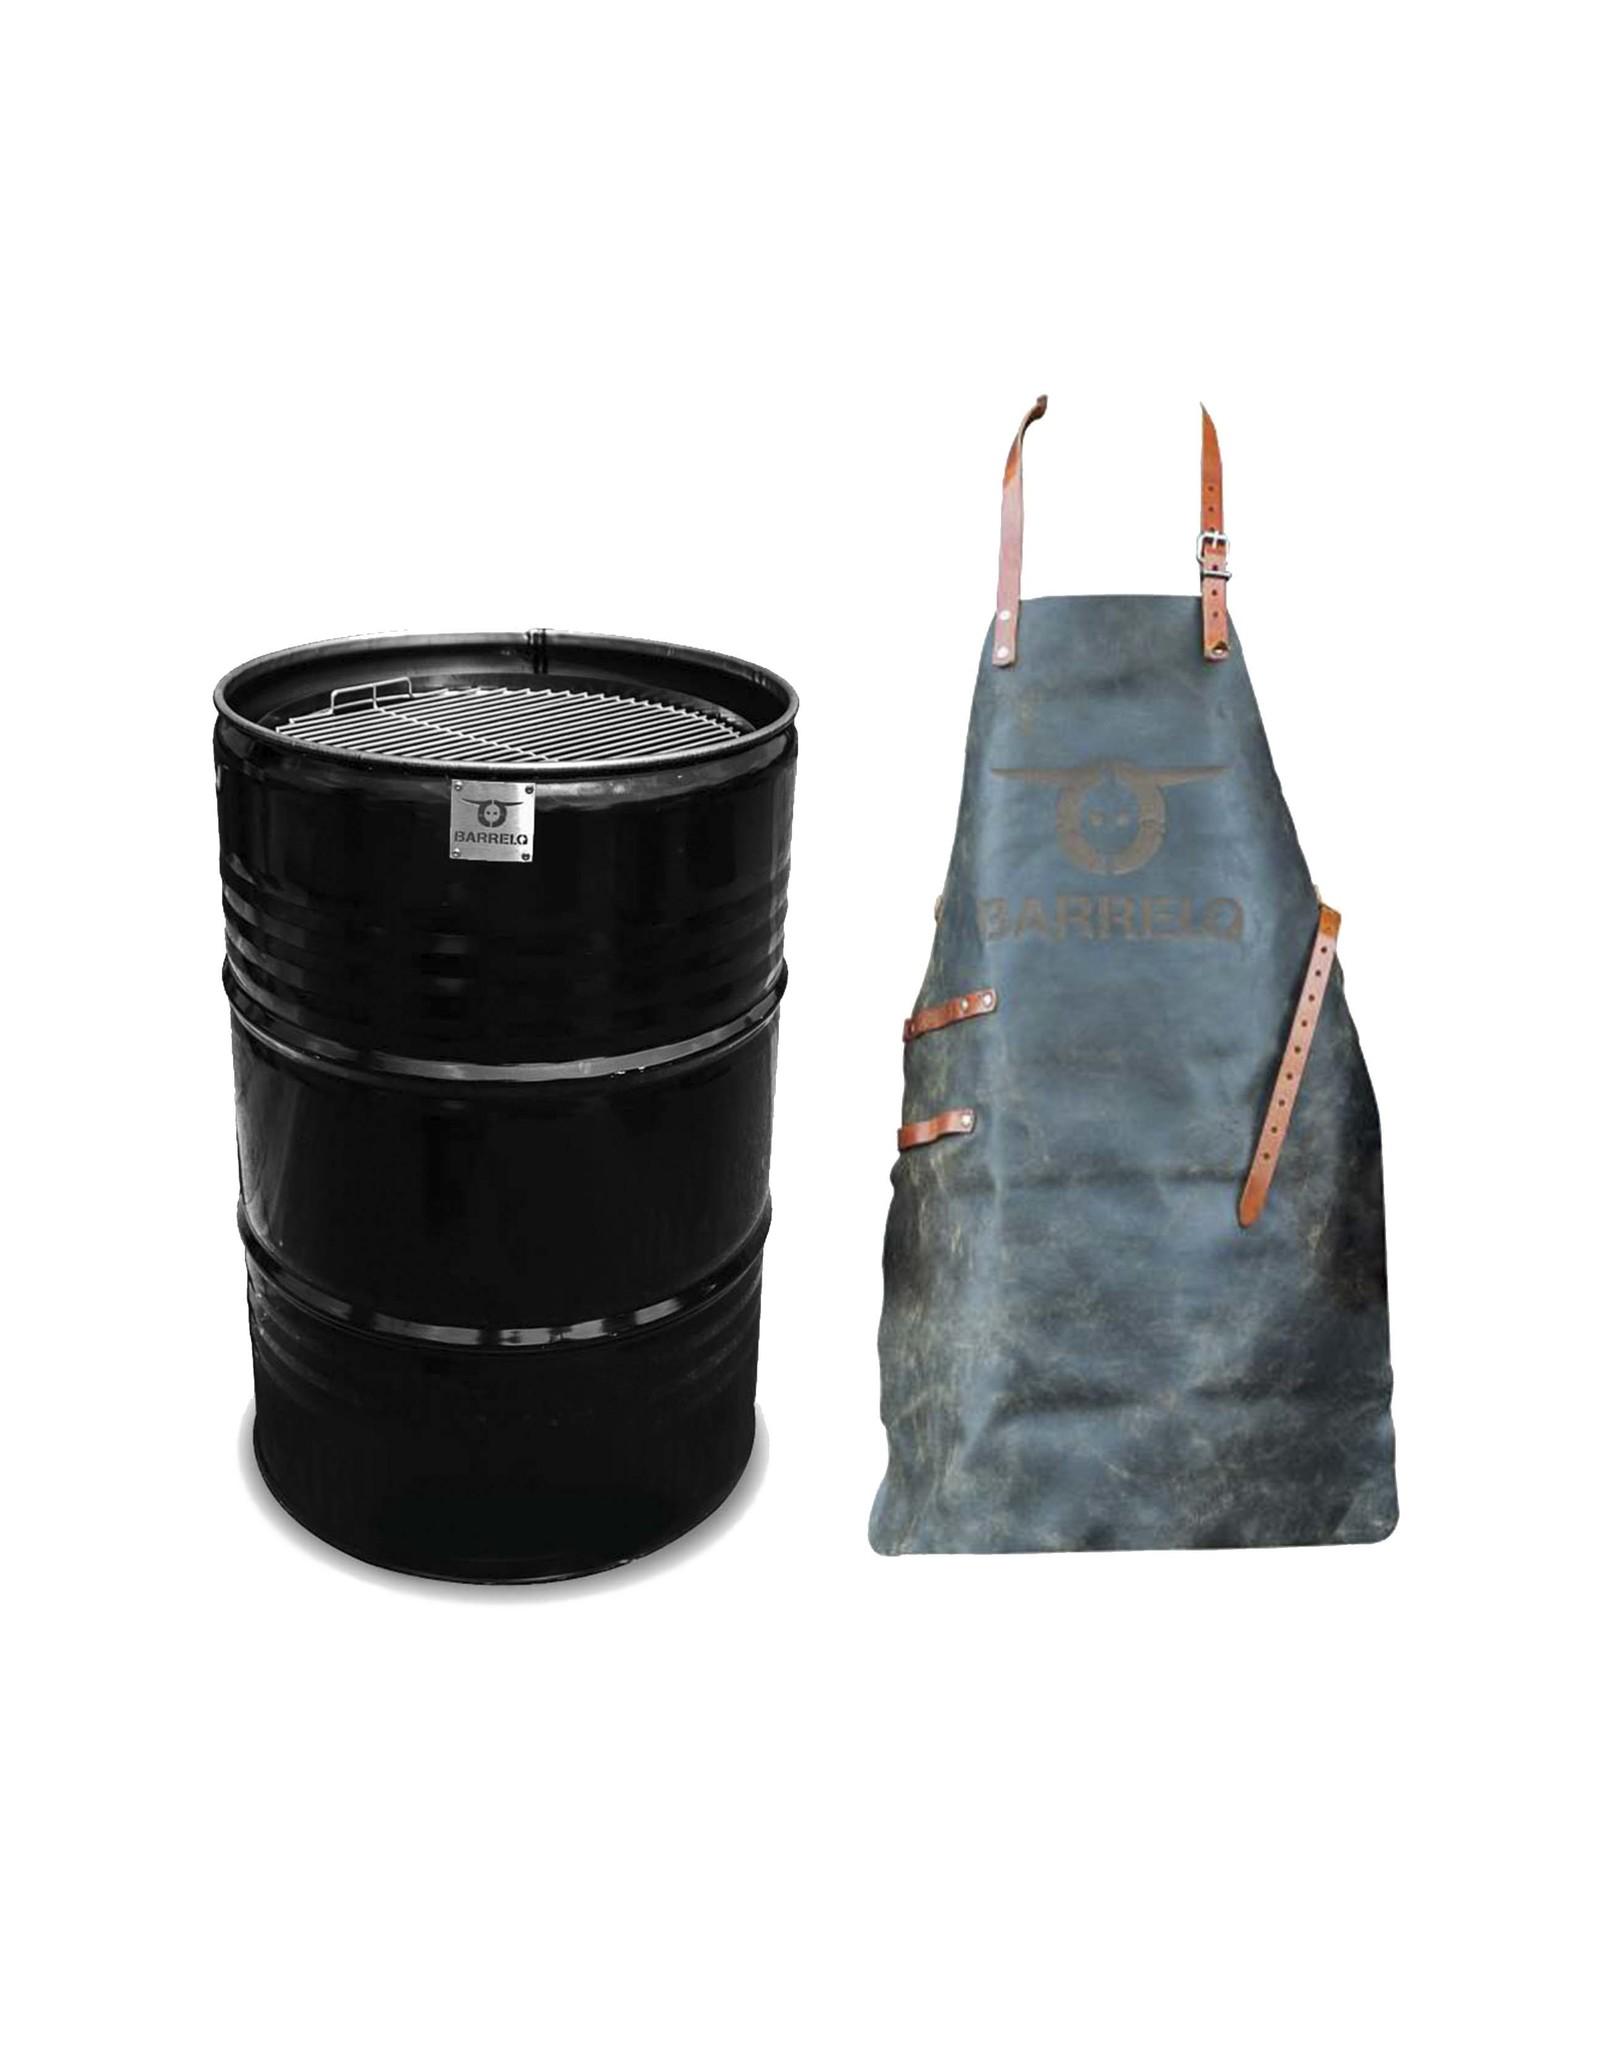 BarrelQ  BarrelQ Big Original plus leather apron